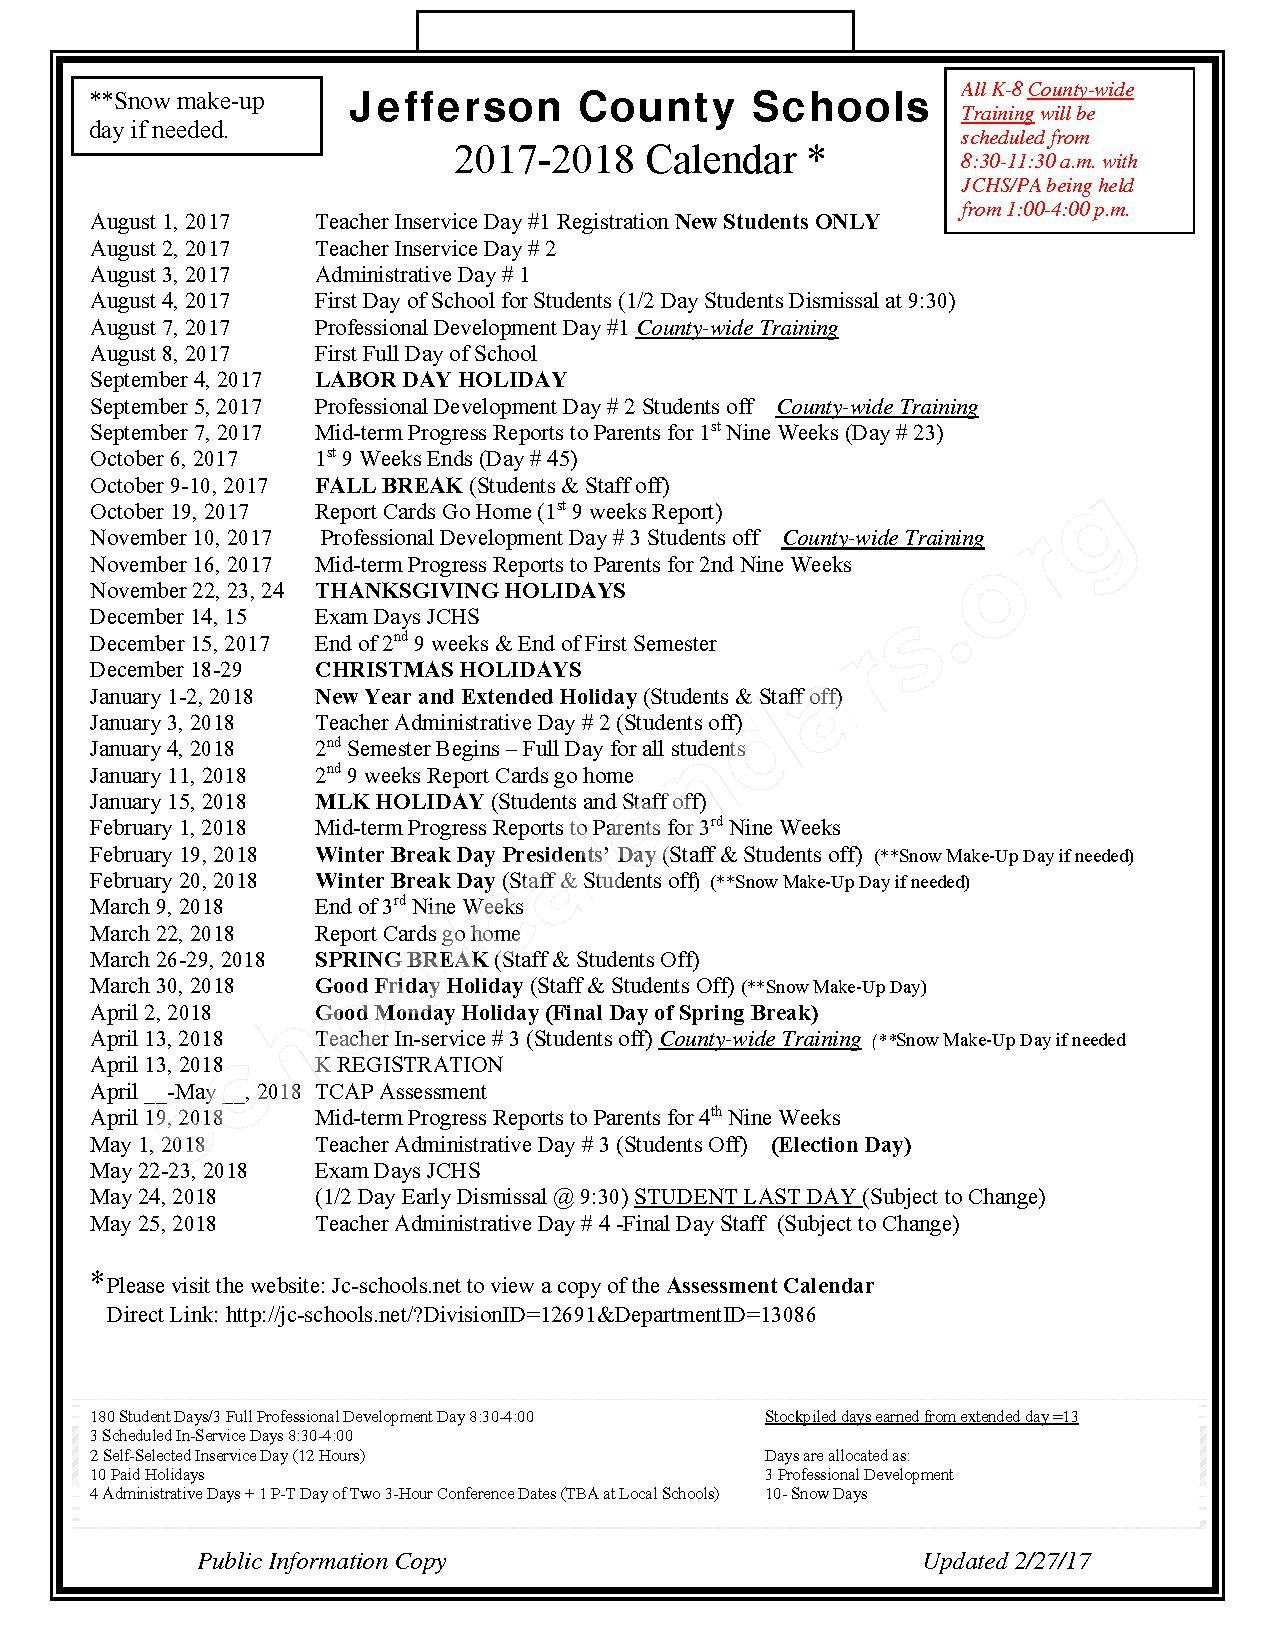 Jefferson County Schools Calendars – Dandridge, Tn_School Calendar Jefferson County Tn